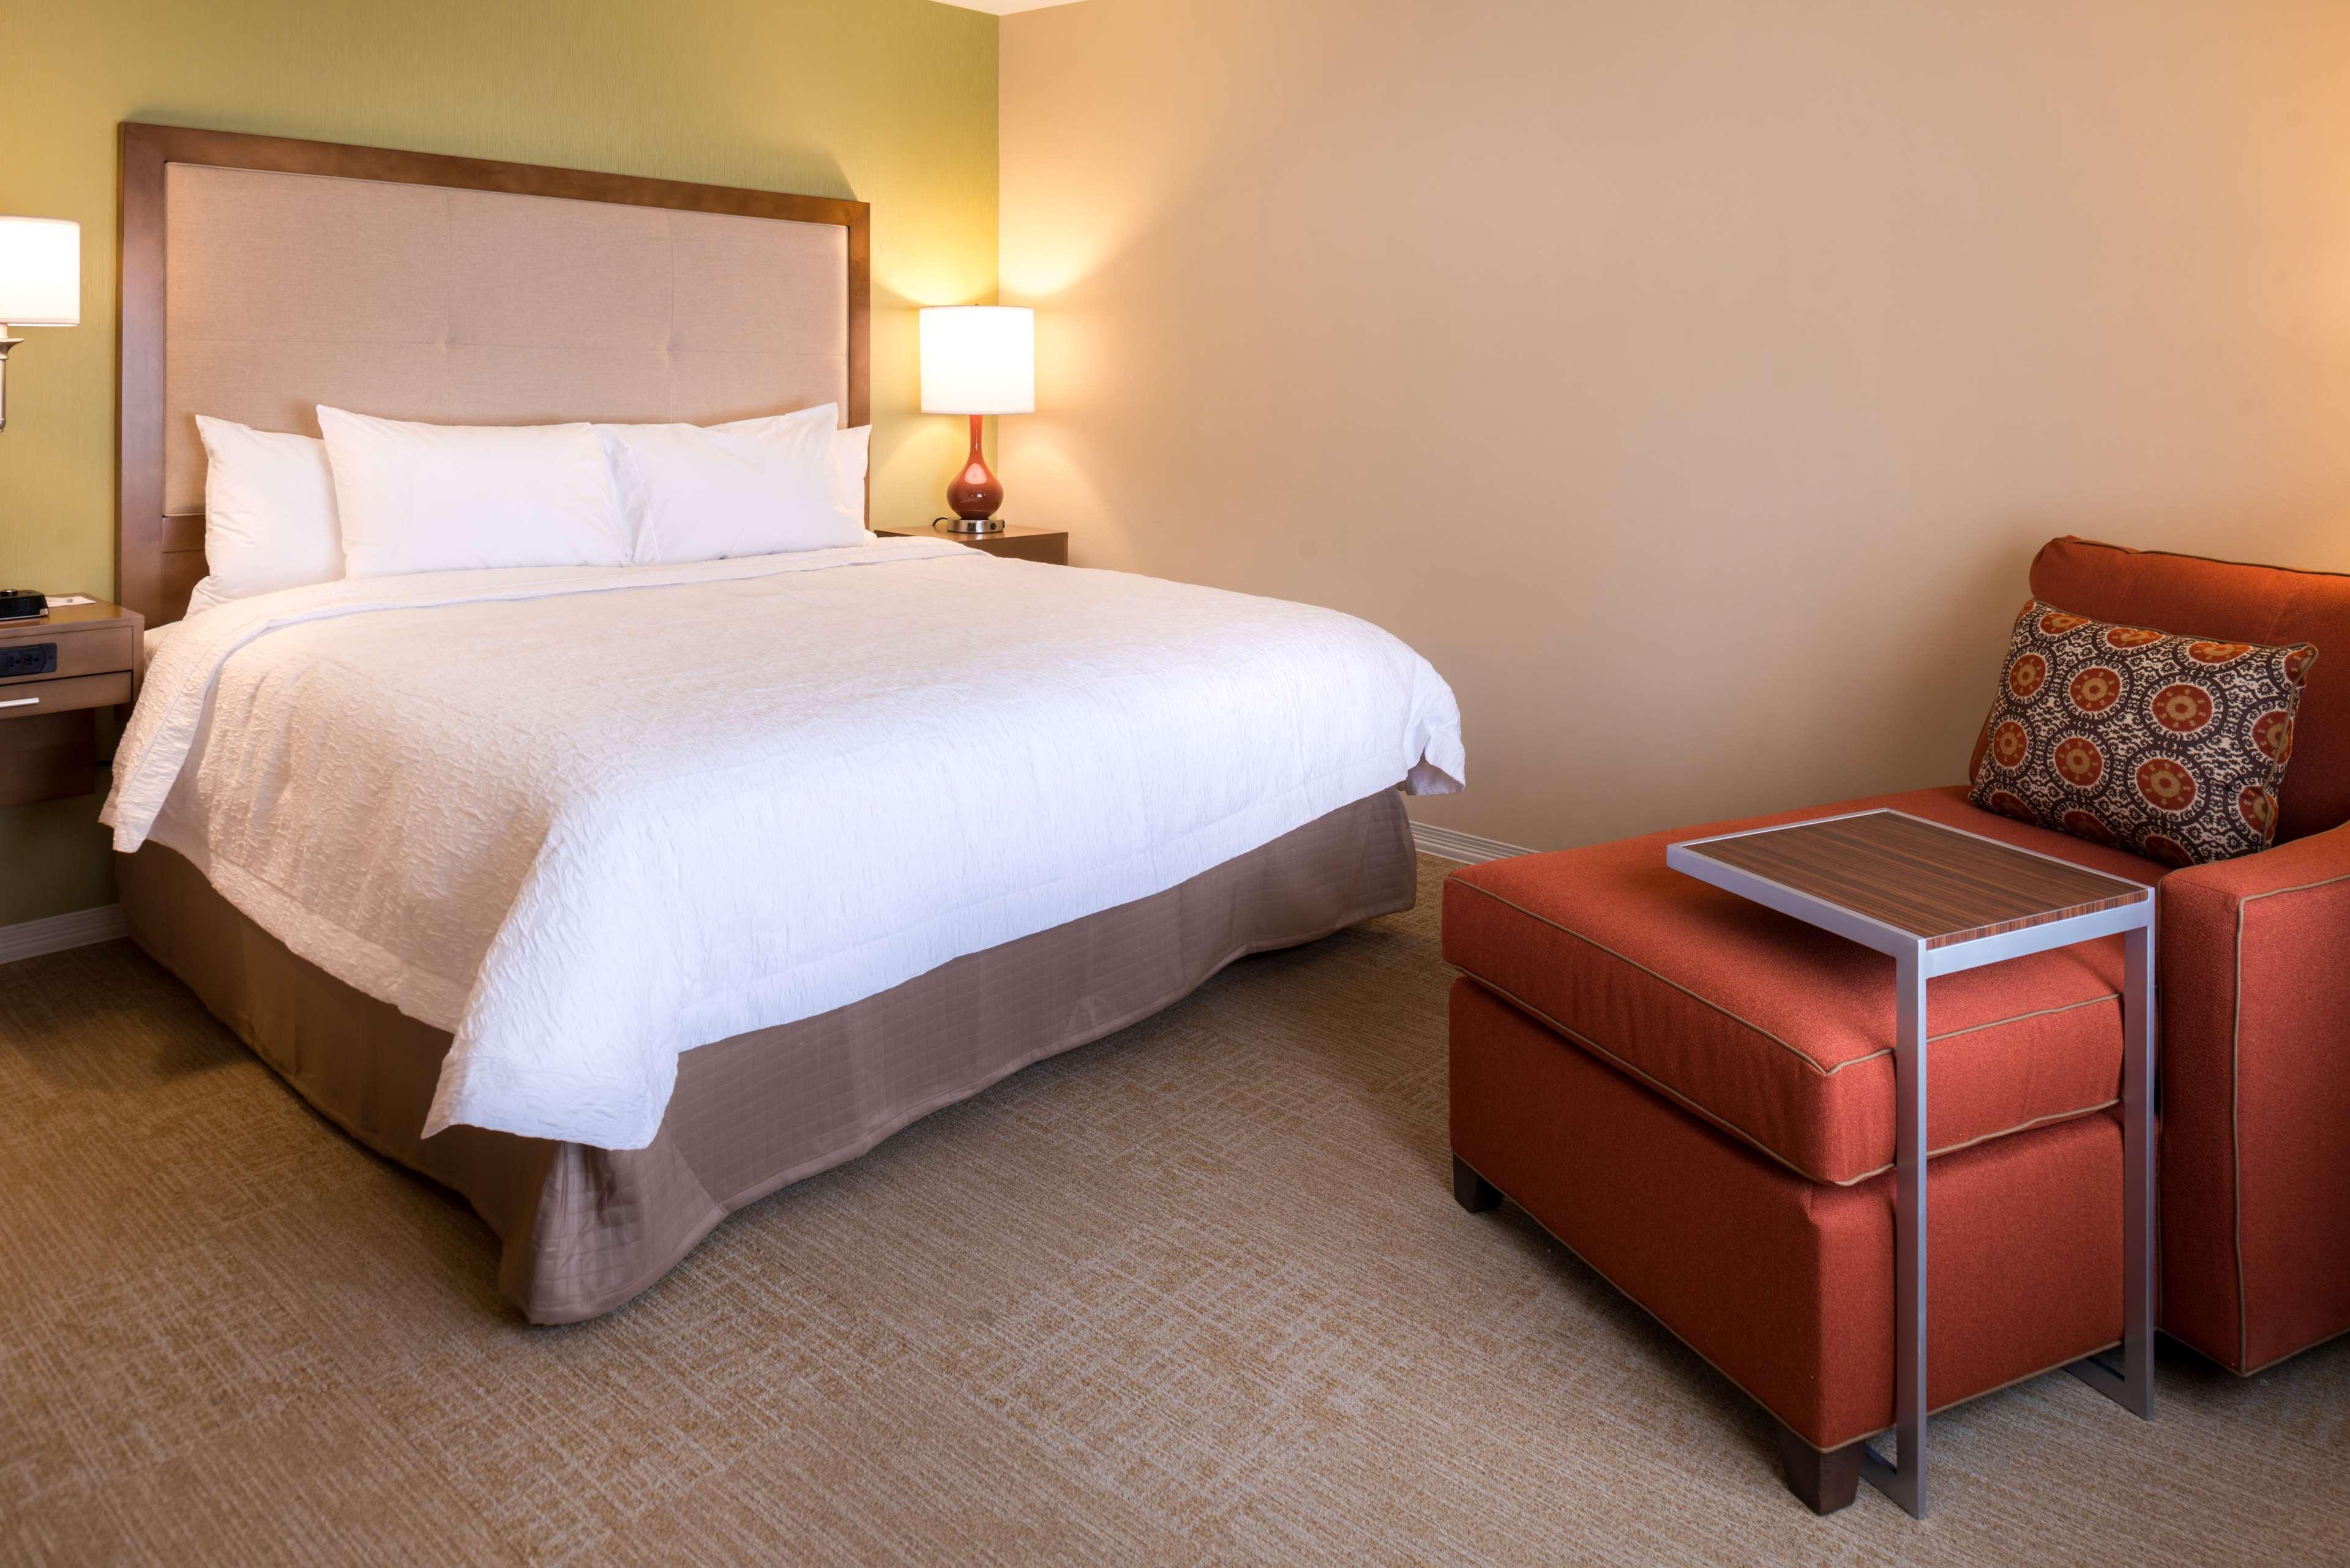 Hampton Inn & Suites Silverthorne image 23